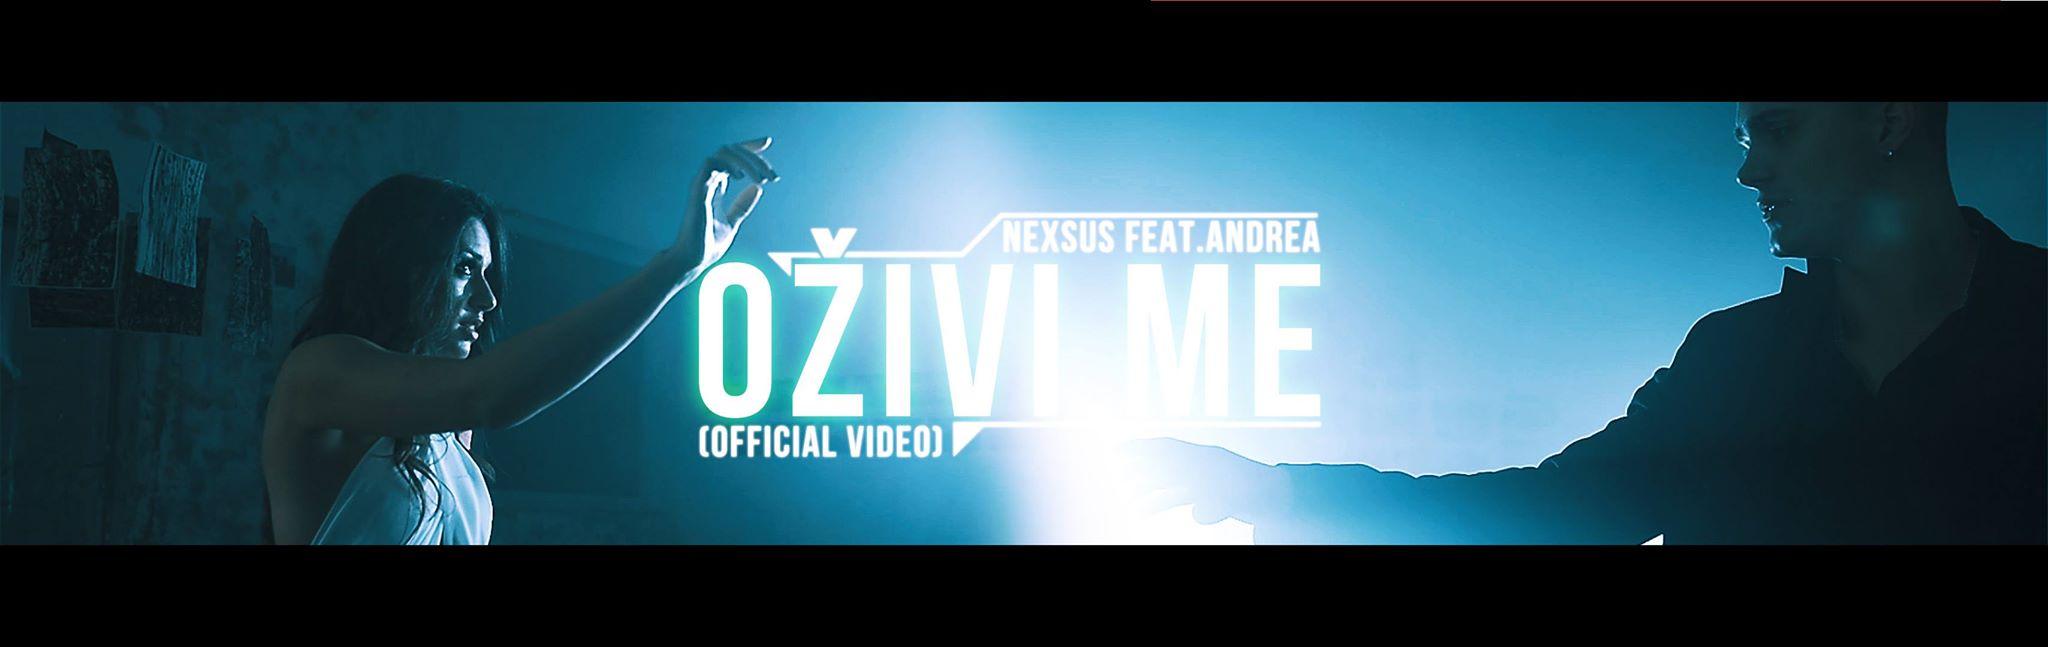 Andrea feat. Nexsus - 2014 - Ozivi Me (Promo)